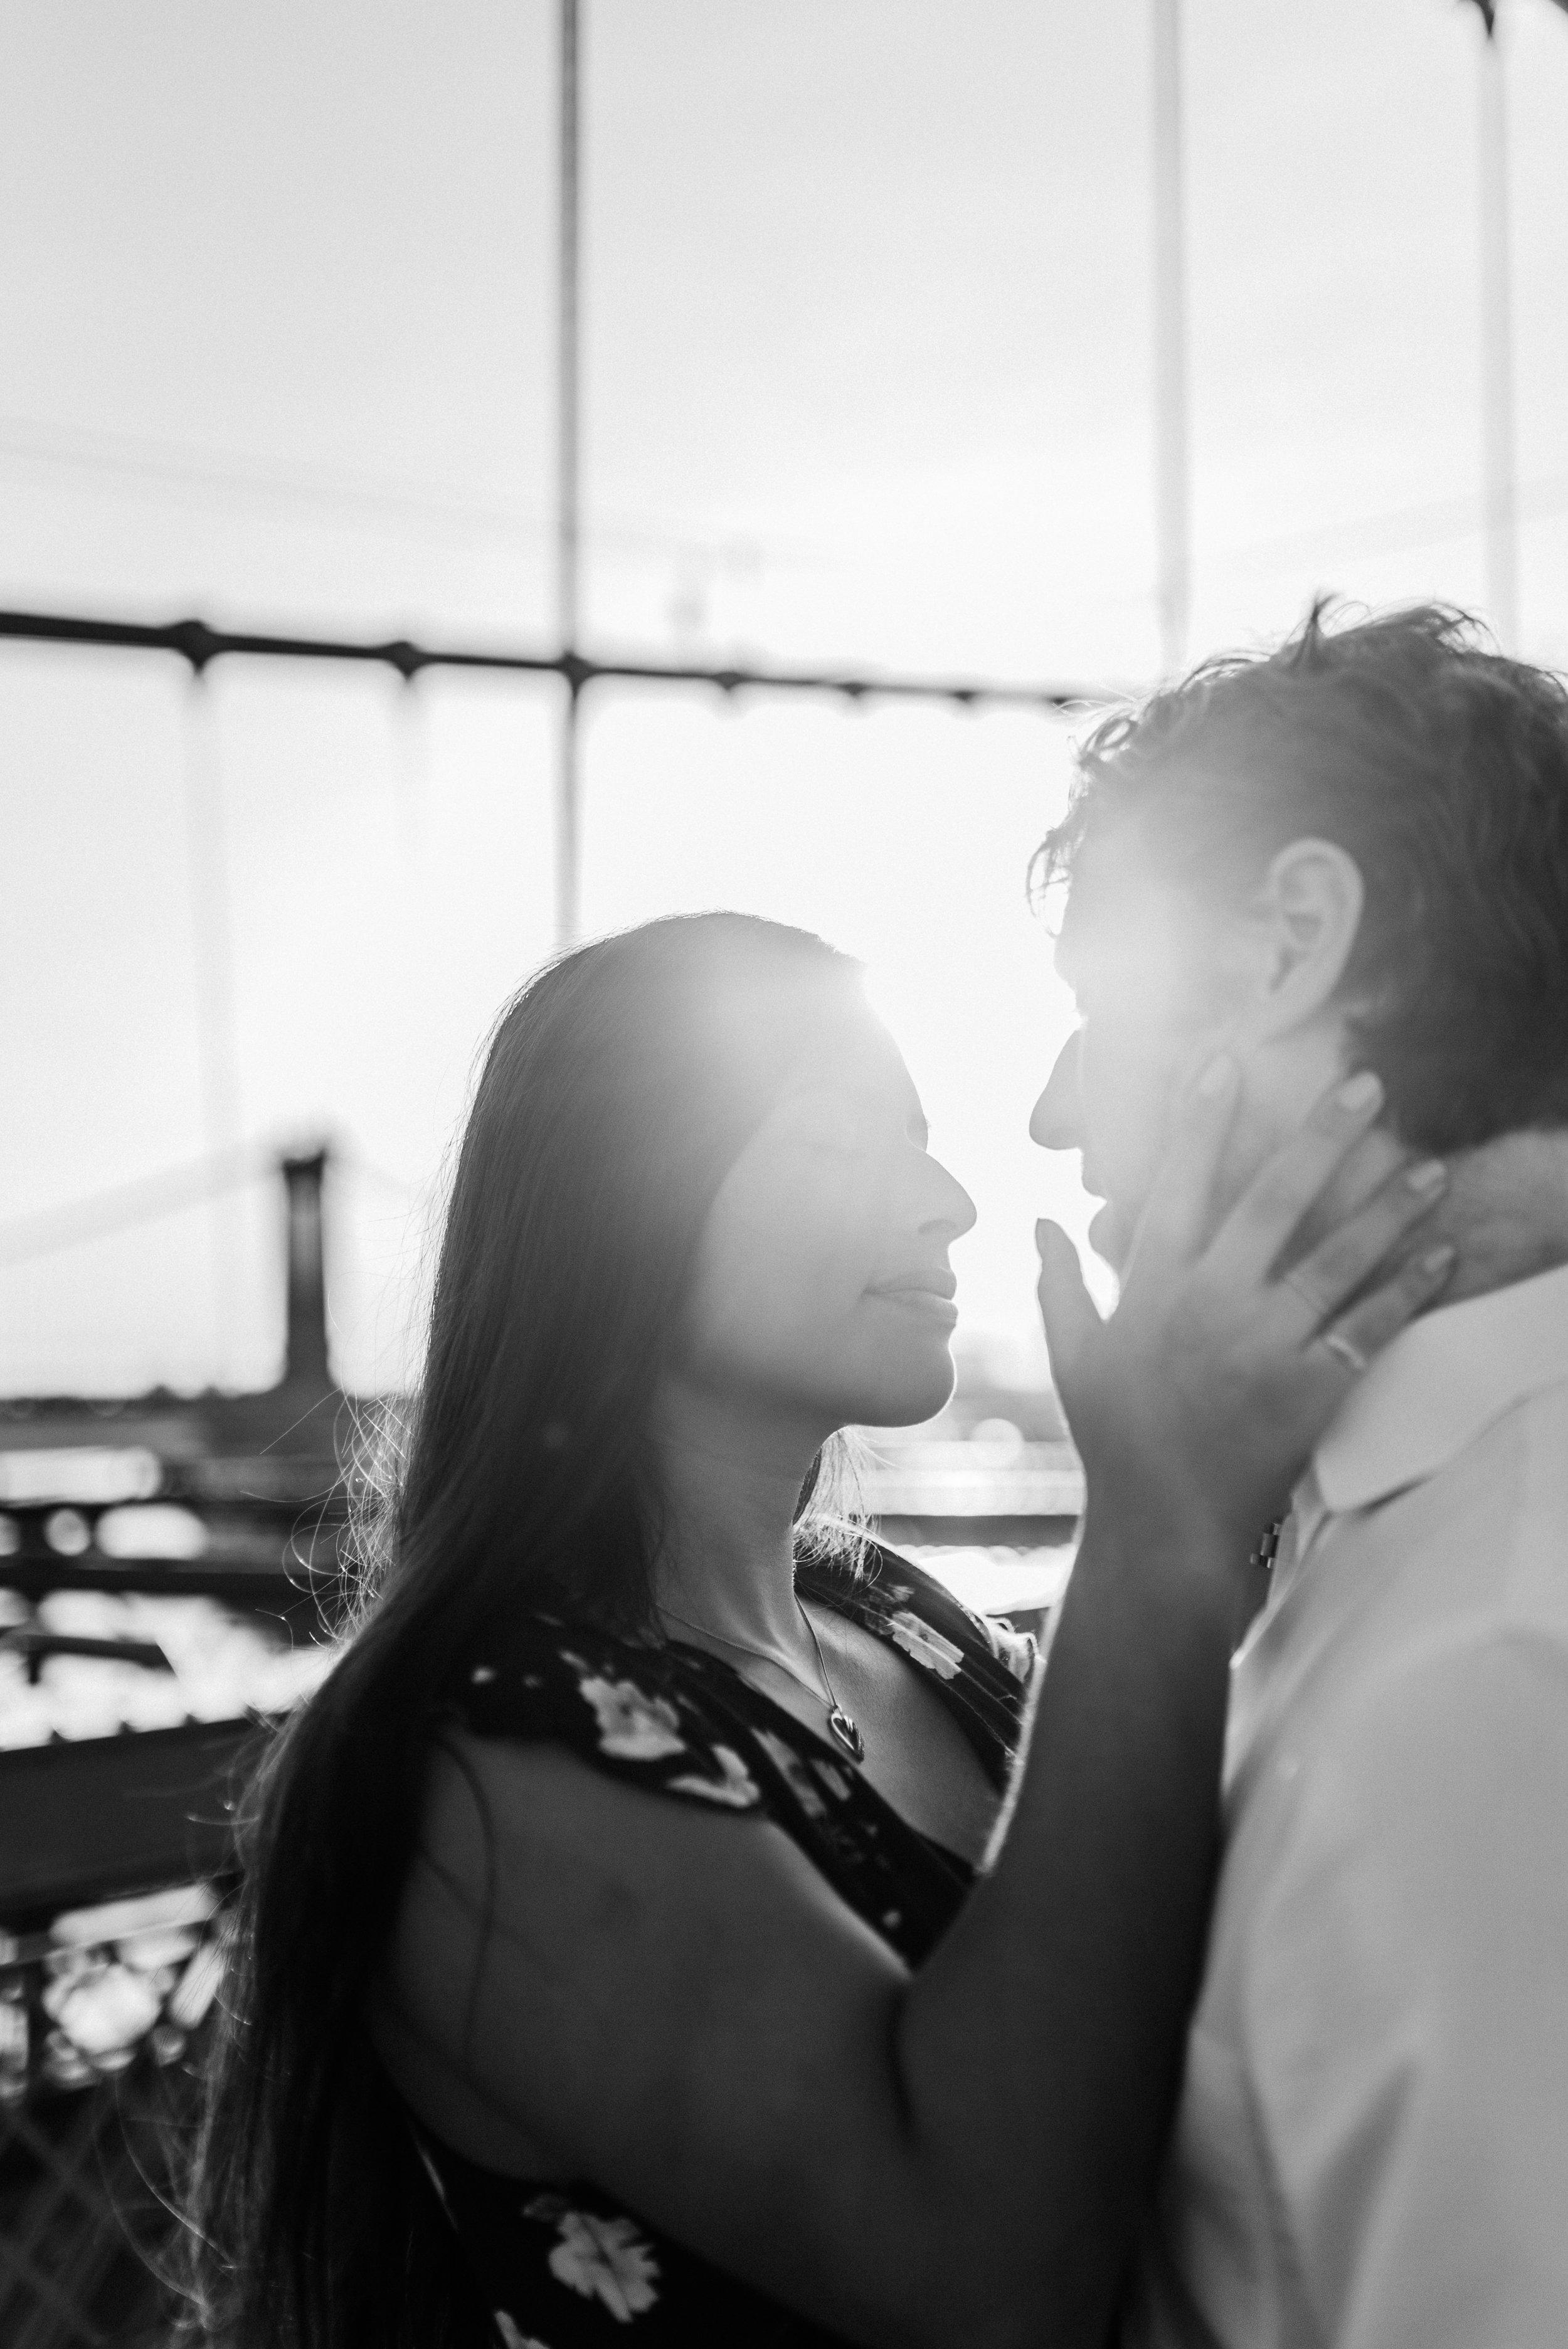 brooklyn bridge engagement shoot, couple shoot nyc, nyc wedding photographer, destination wedding photographer, documentary wedding photographer in nyc (16).jpg